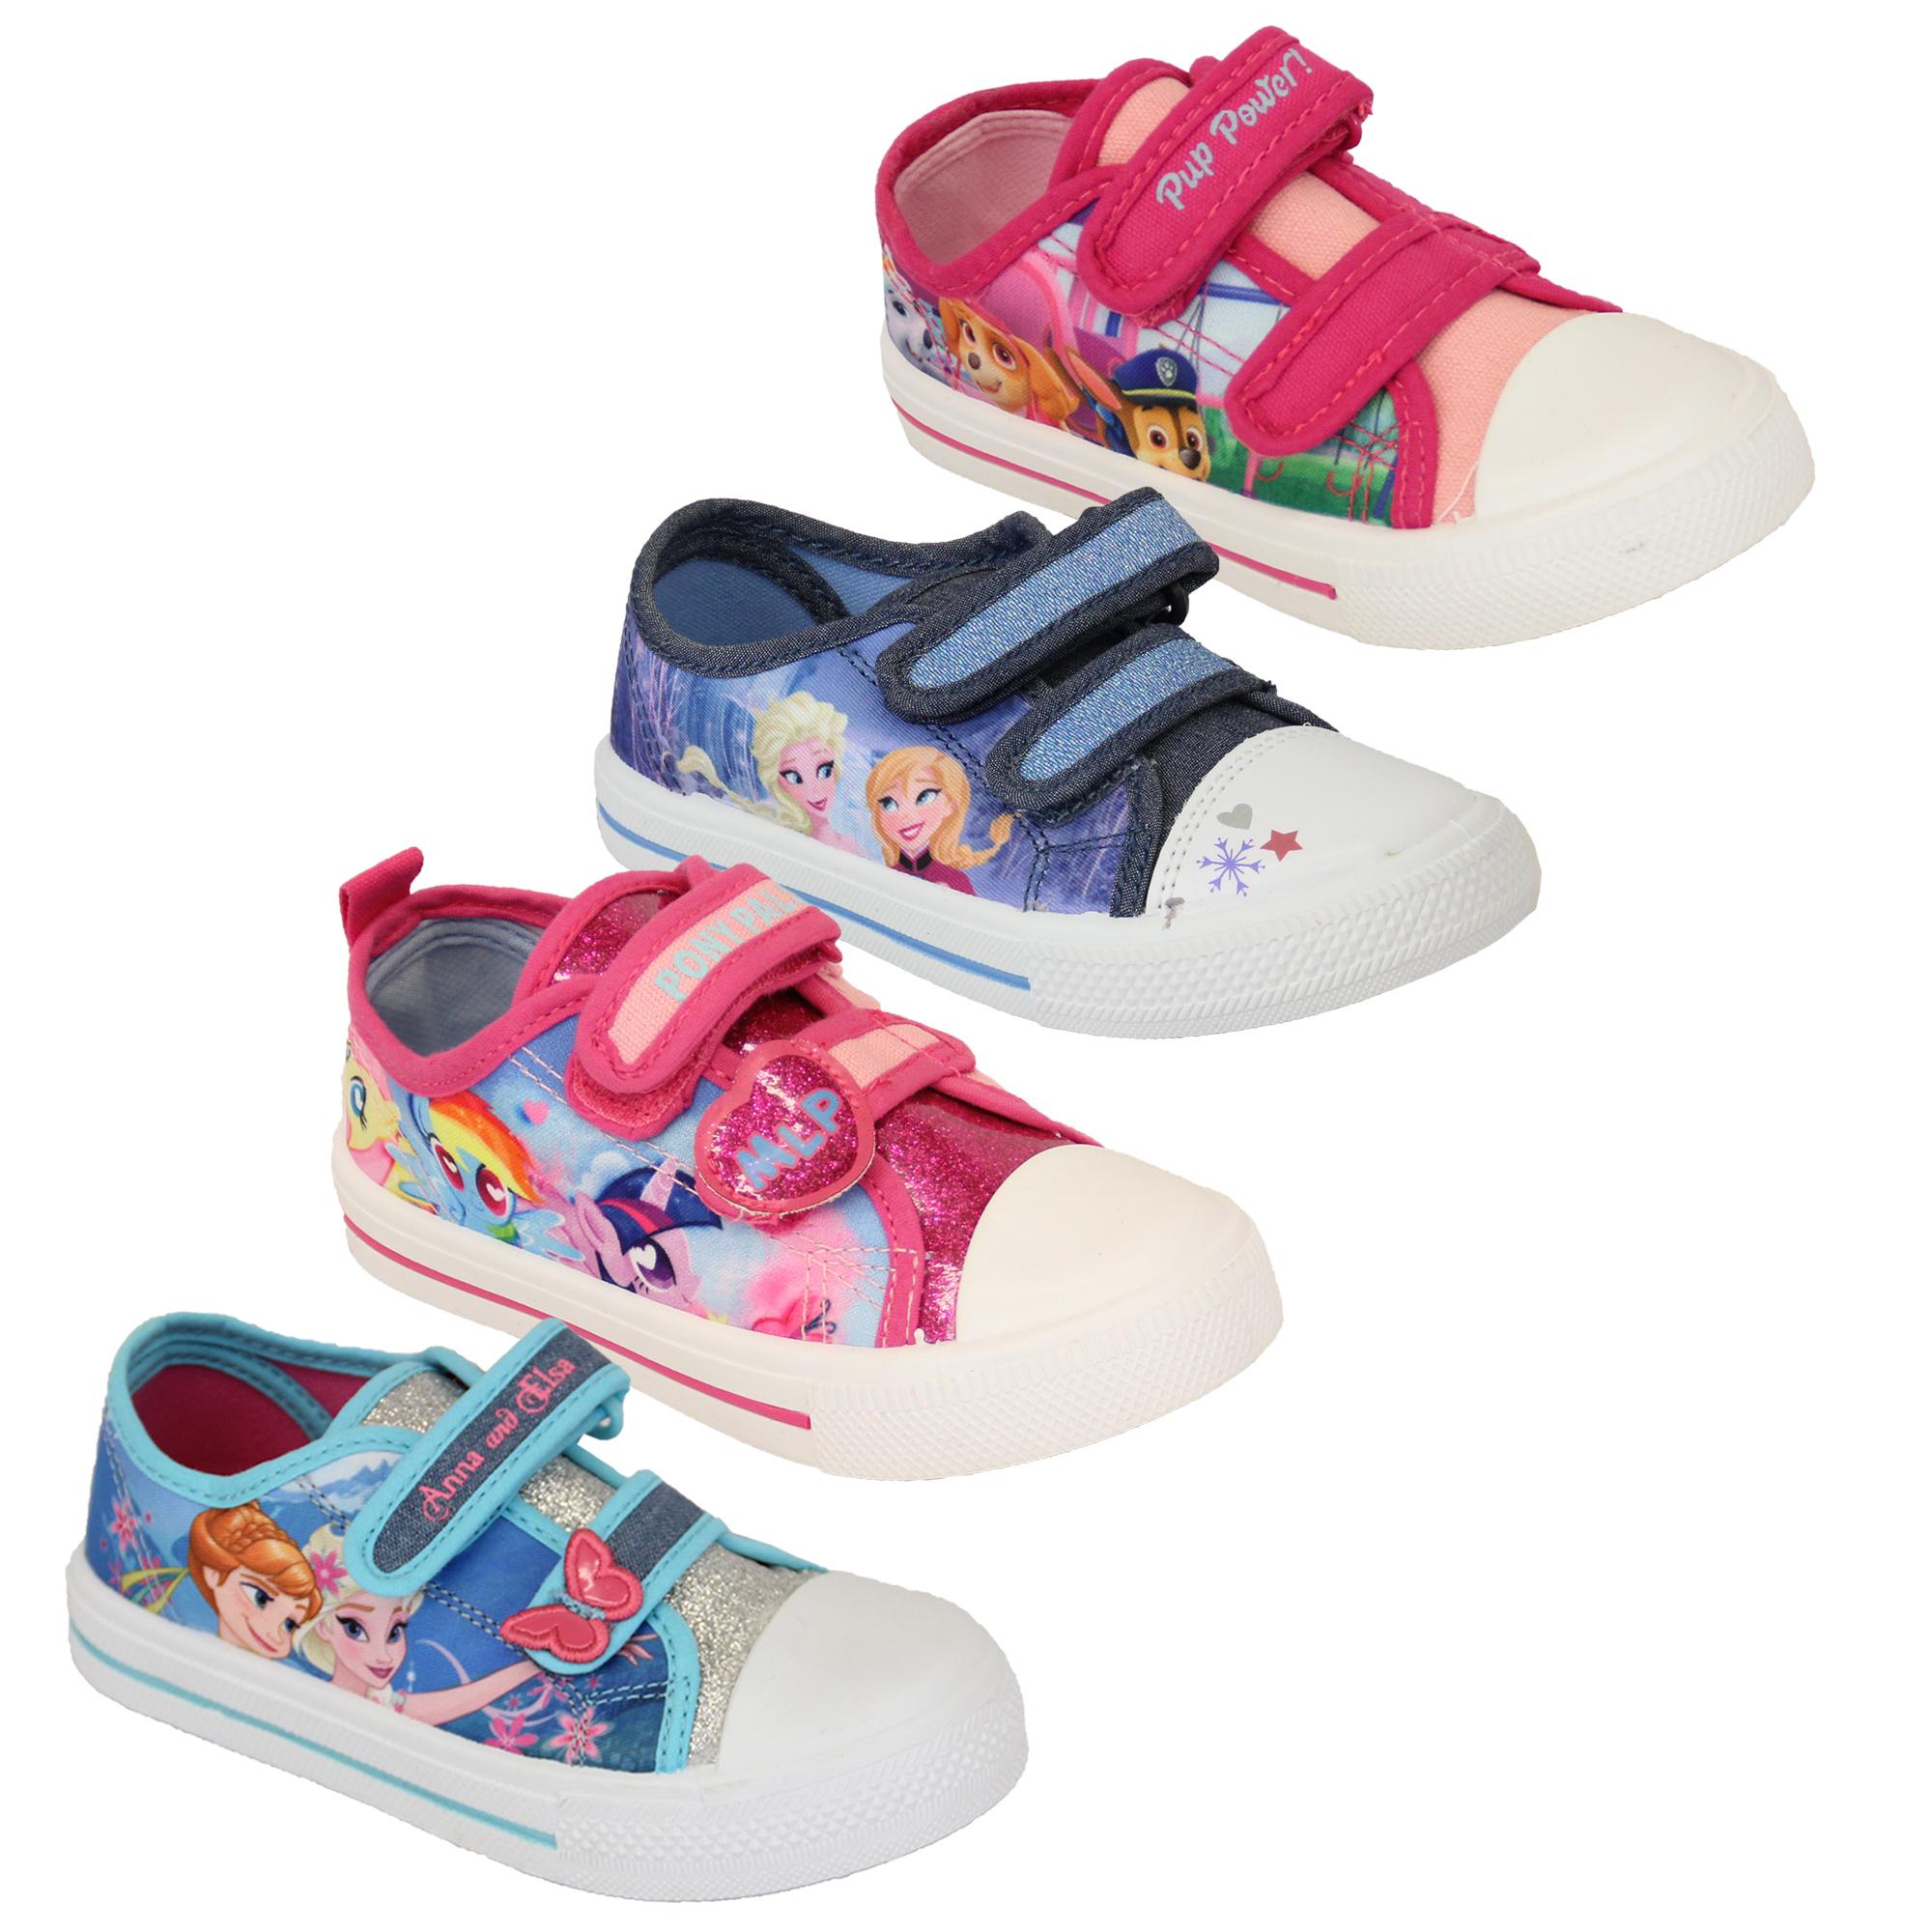 huge selection of 881af 88164 Dettagli su Bambine Ragazze Anna Elsa Paw Patrol Tela My Little Pony Scarpe  Ballerine Nuovo